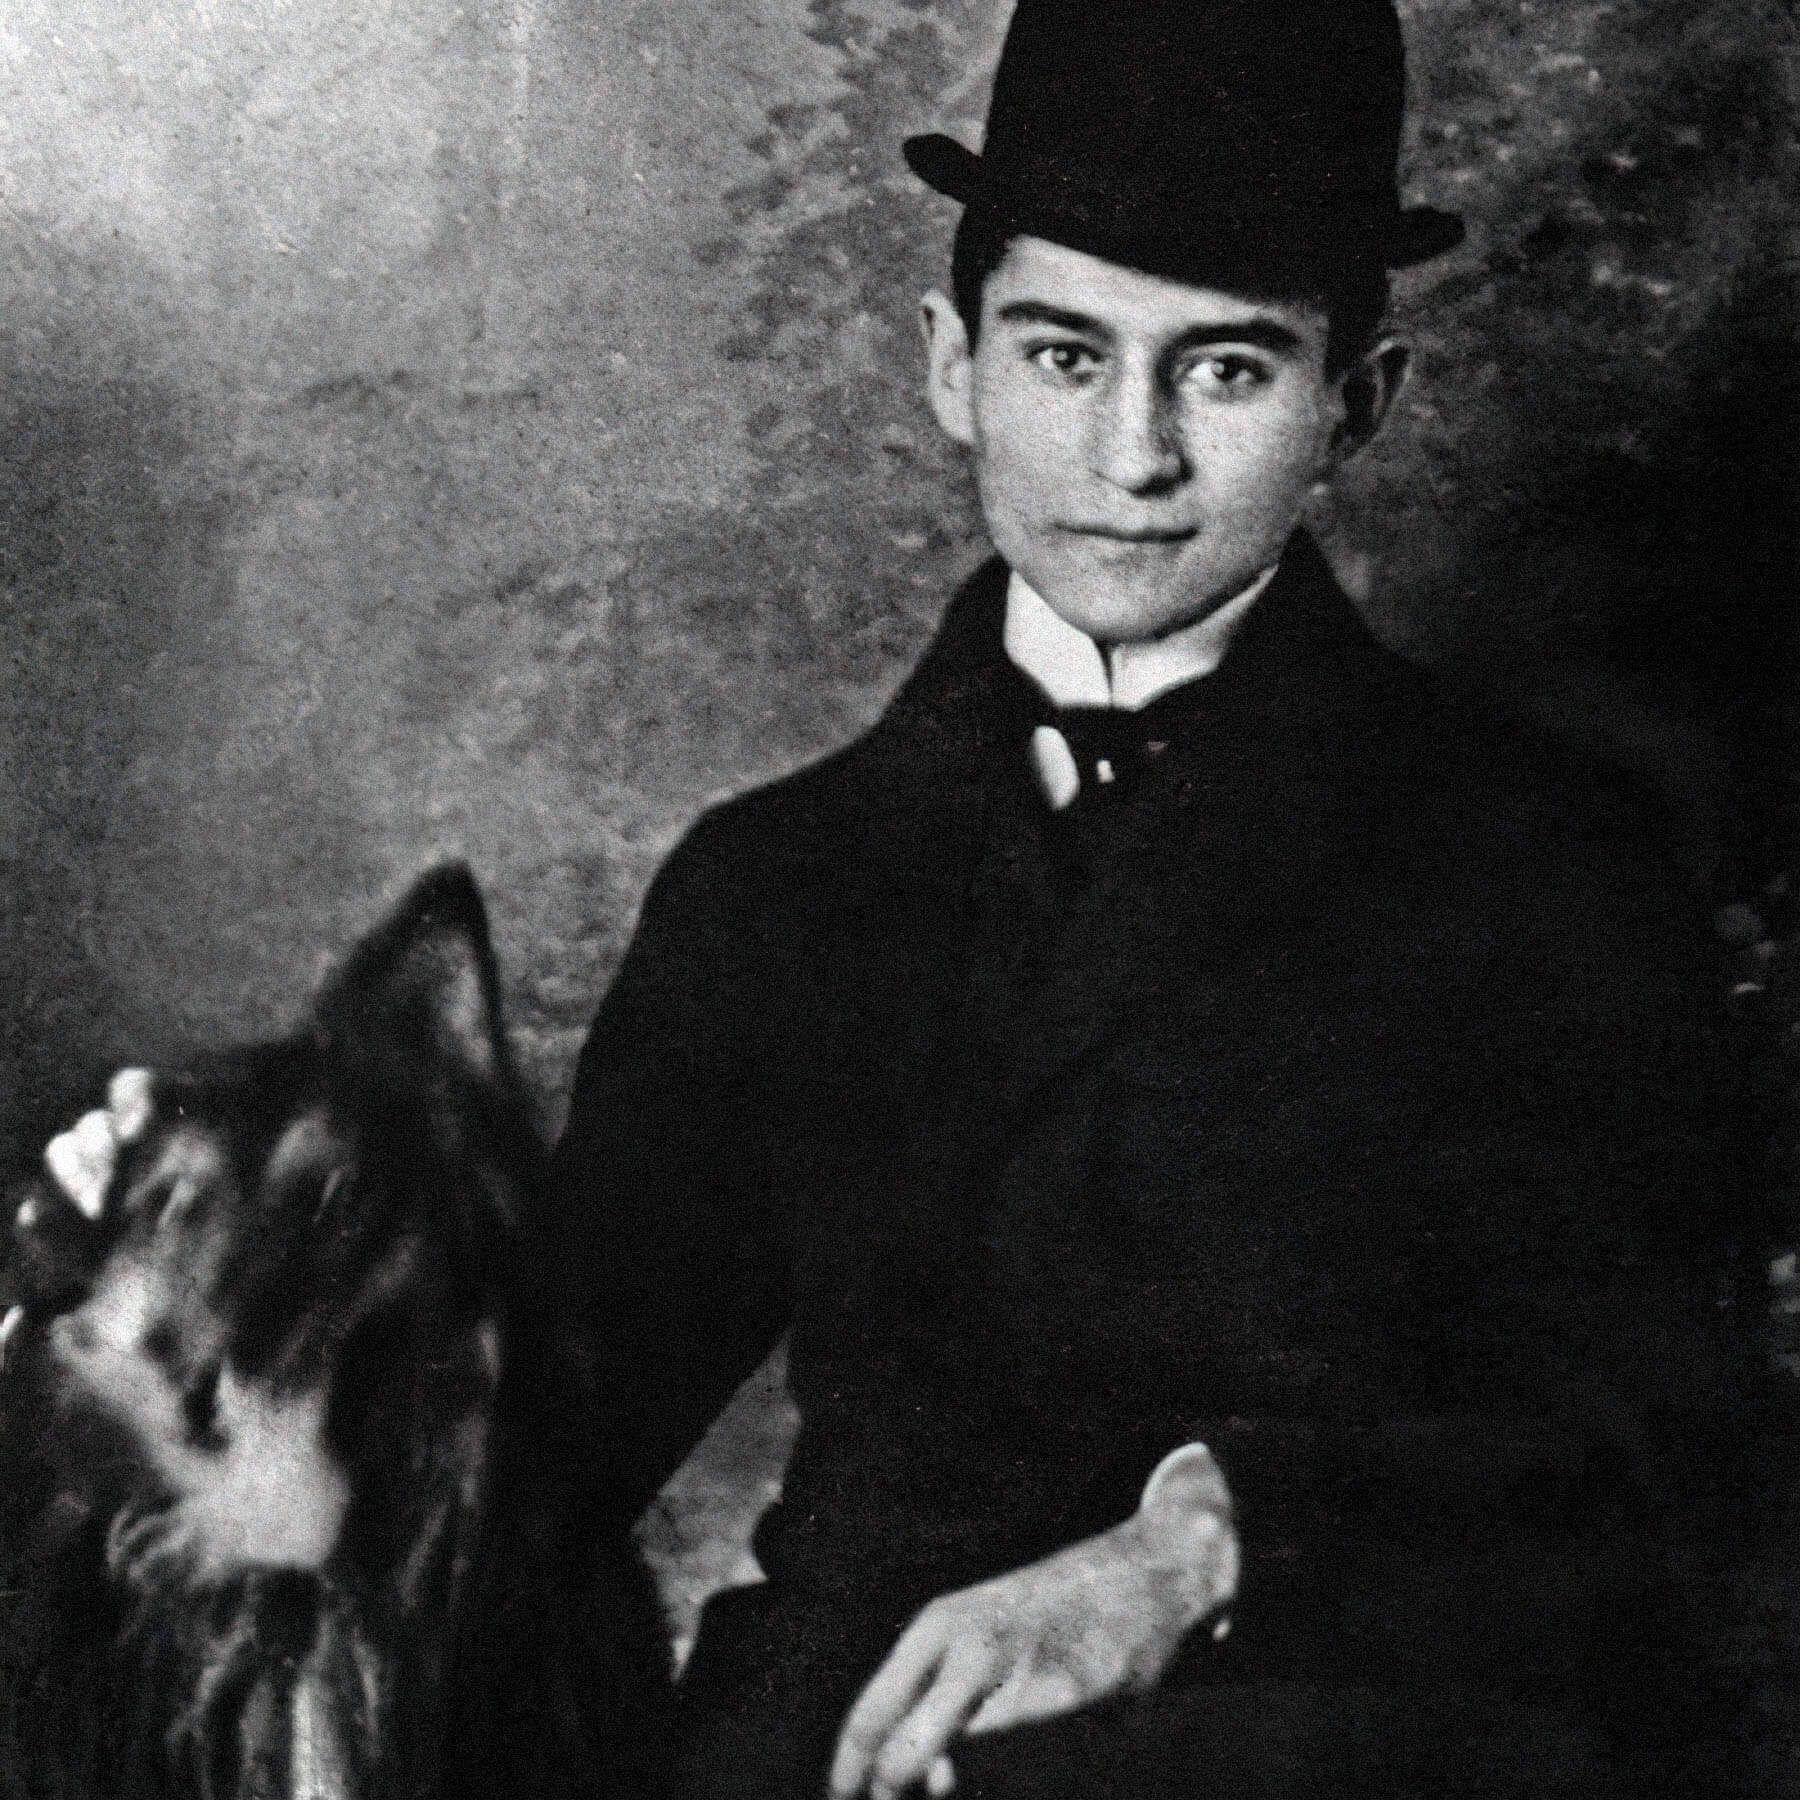 Франц Кафка в 1910 году / vieusseux.it